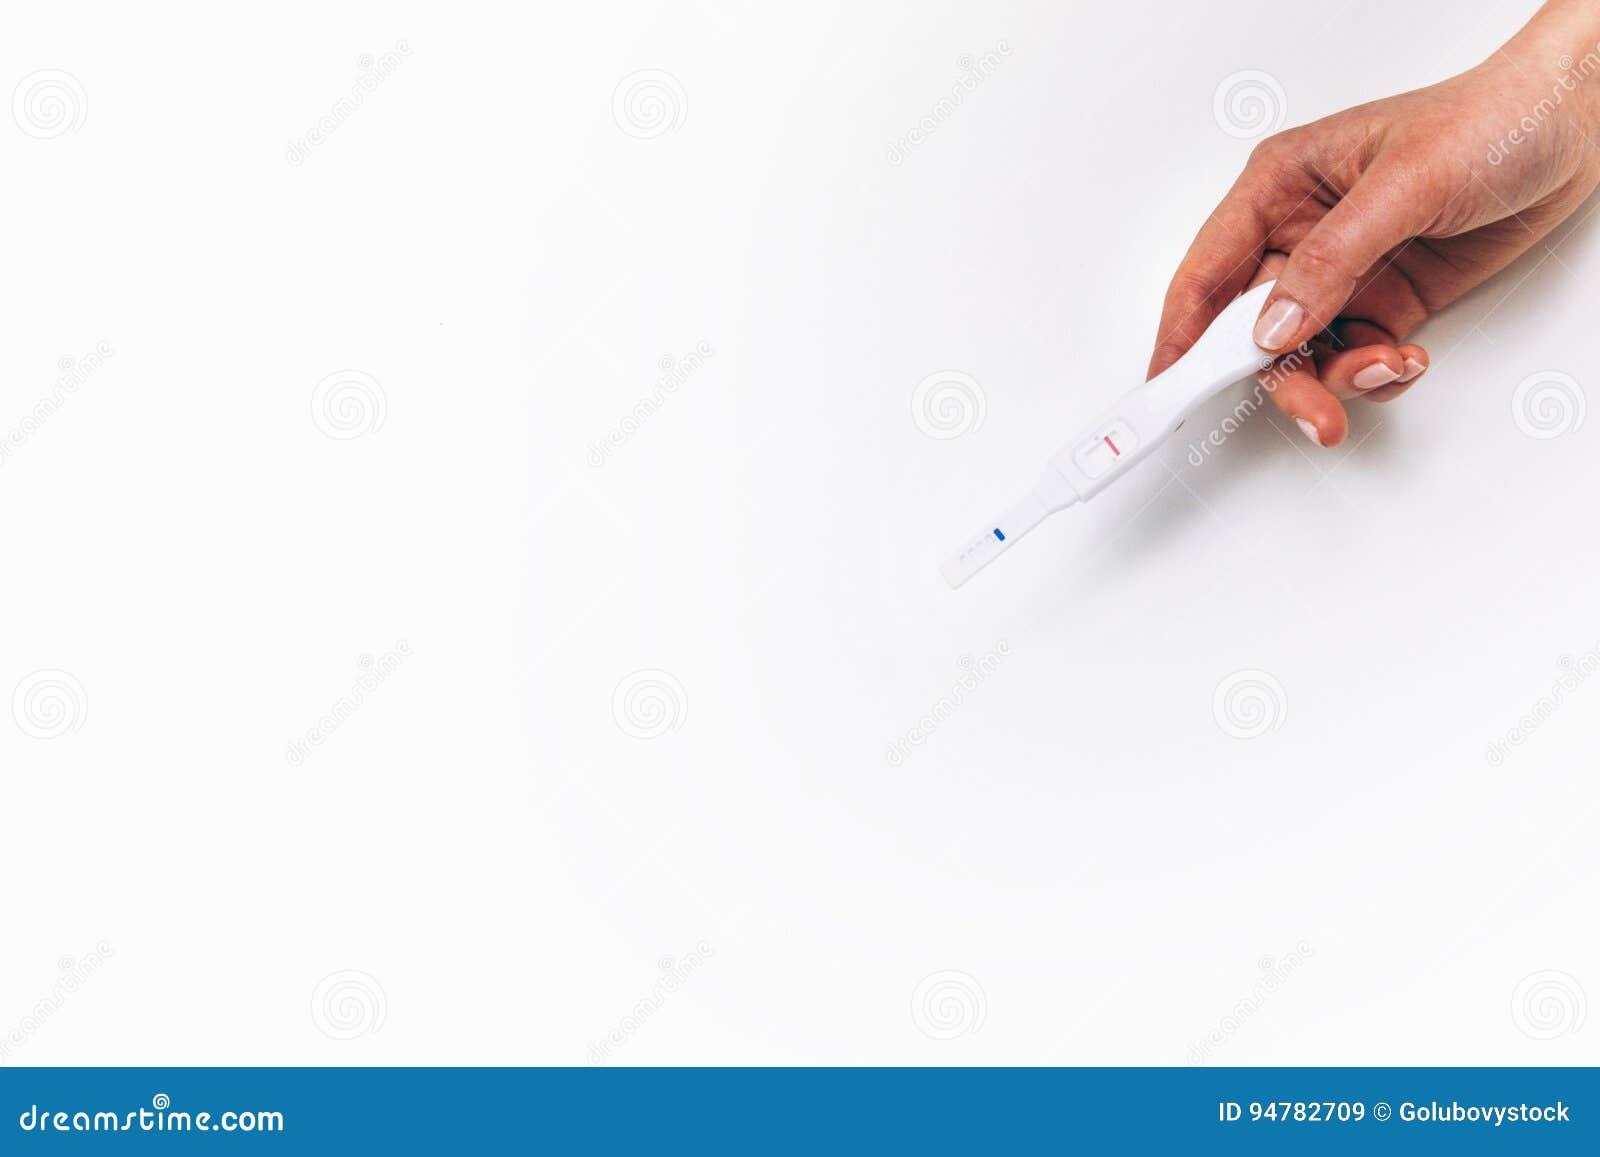 Negative Pregnancy Test  Childfree, Birth Control  Stock